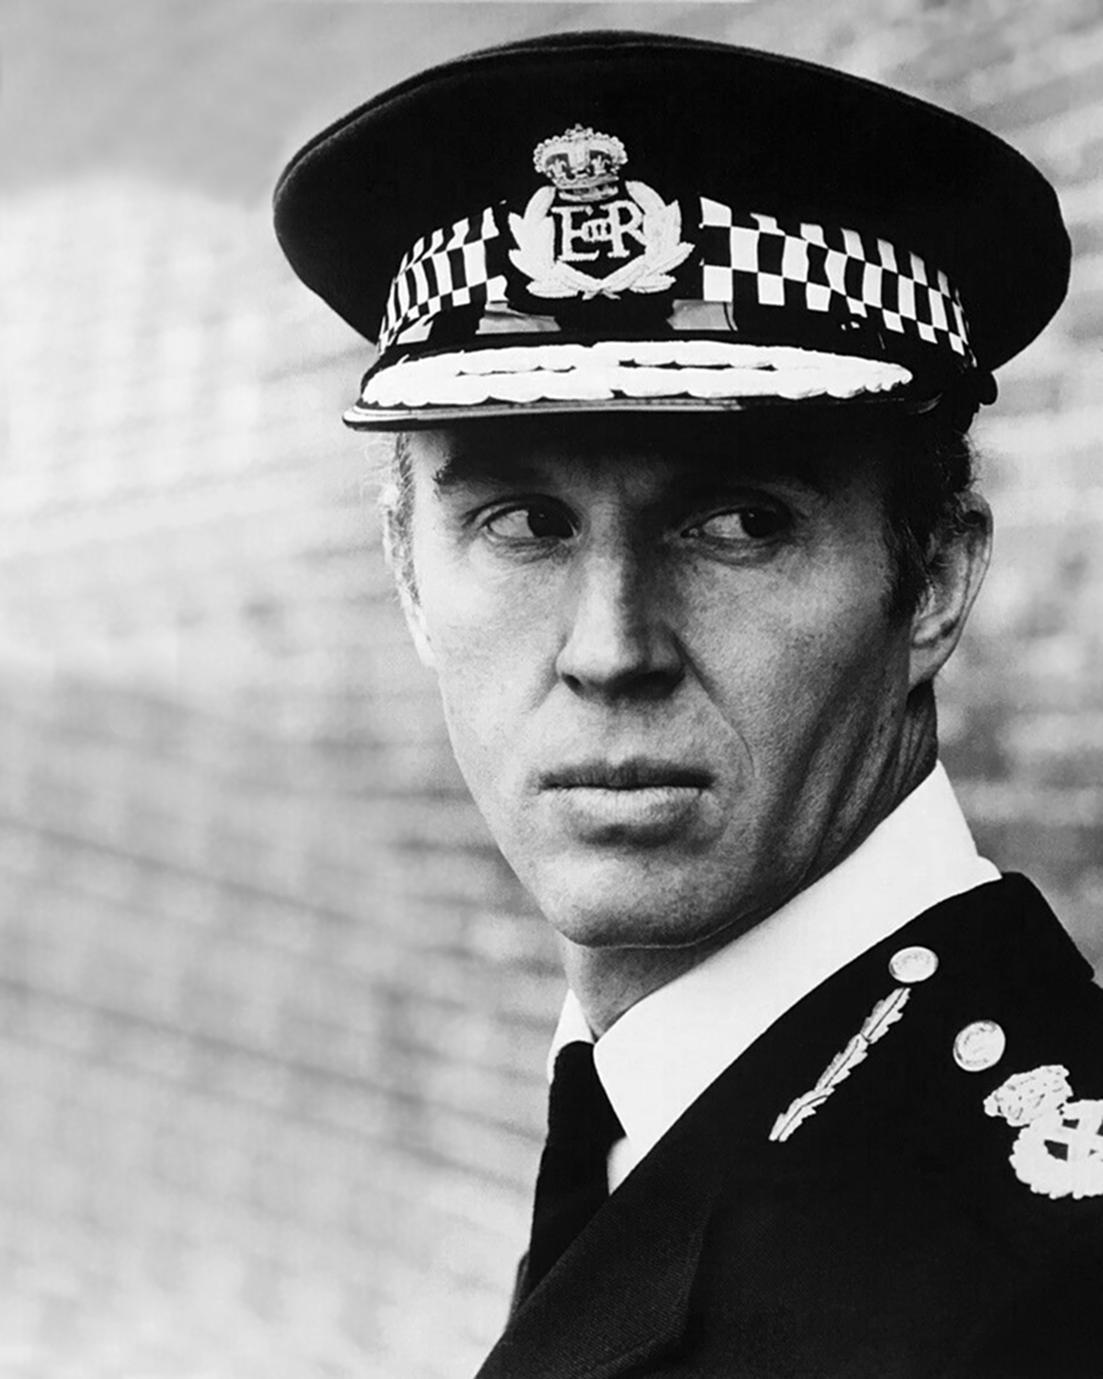 Tim Pigott-Smith in The Chief (1990)